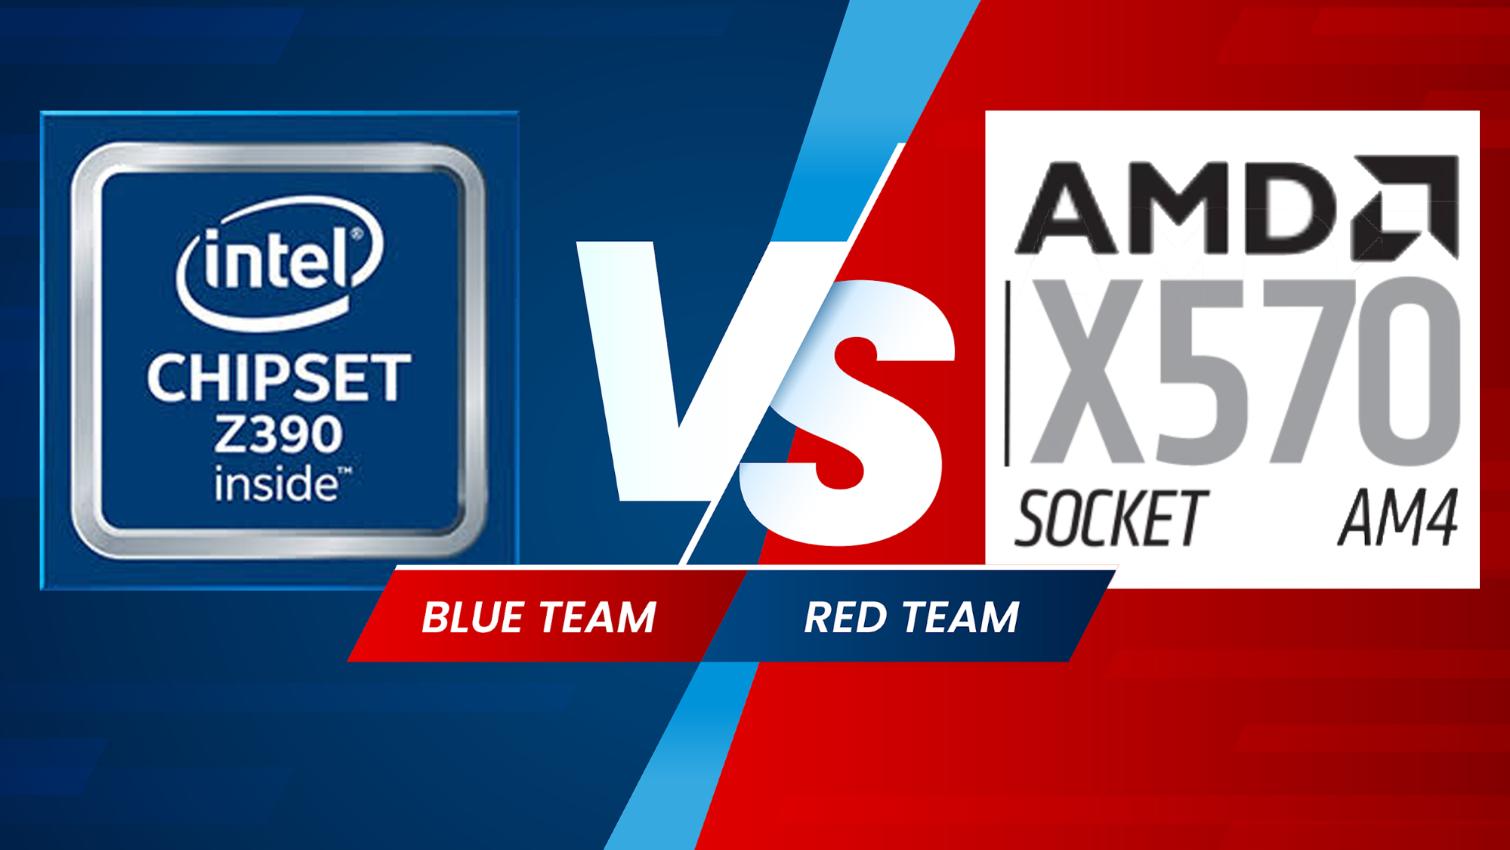 Amd X570 Vs Intel Z390 Chipset Which Mainstream Platform Is Better Tom S Hardware Tom S Hardware